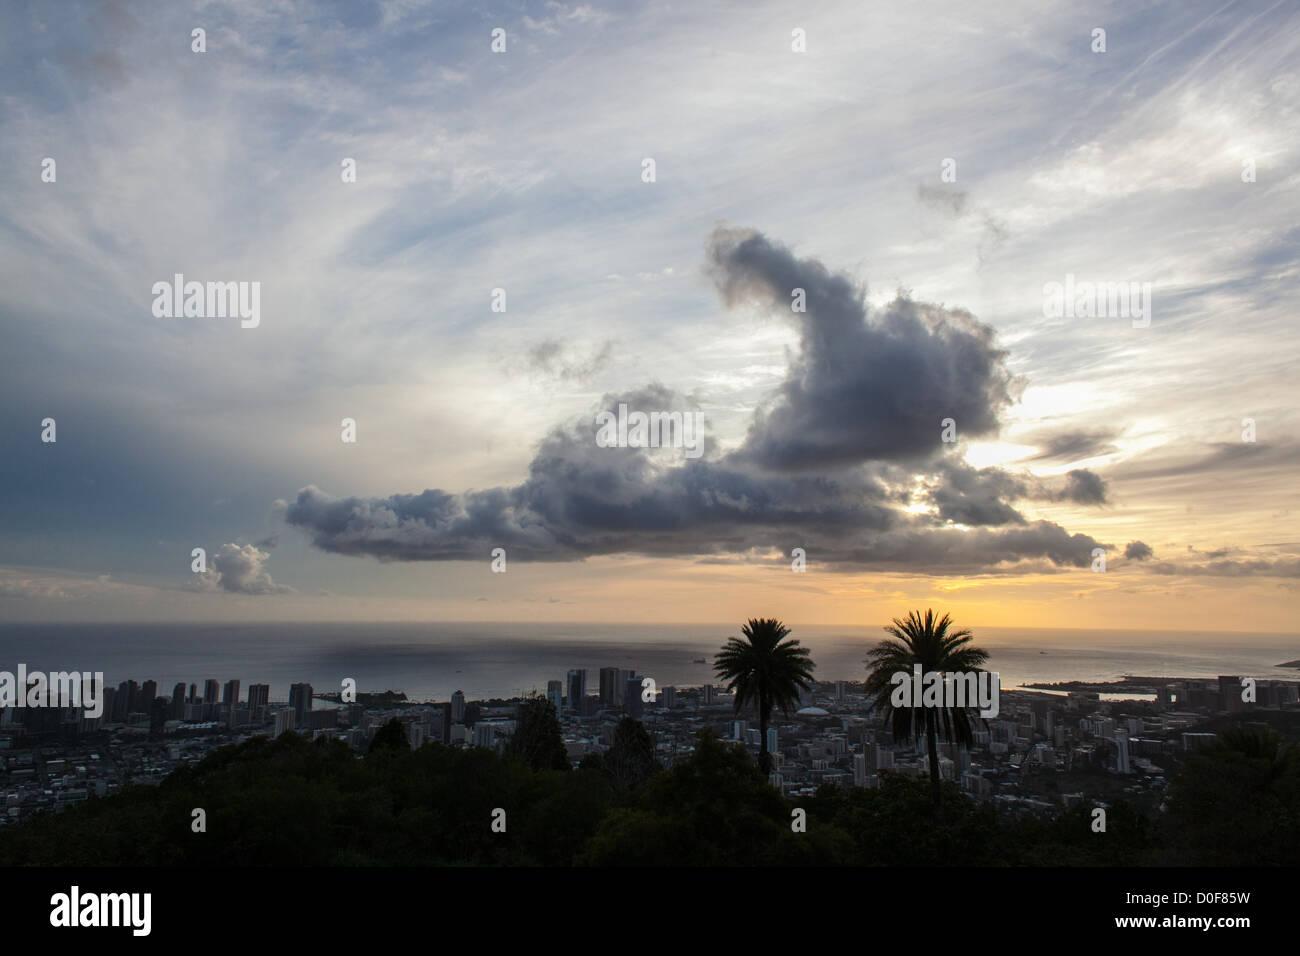 Epic cloud over the Honolulu, Hawaii skyline - Stock Image